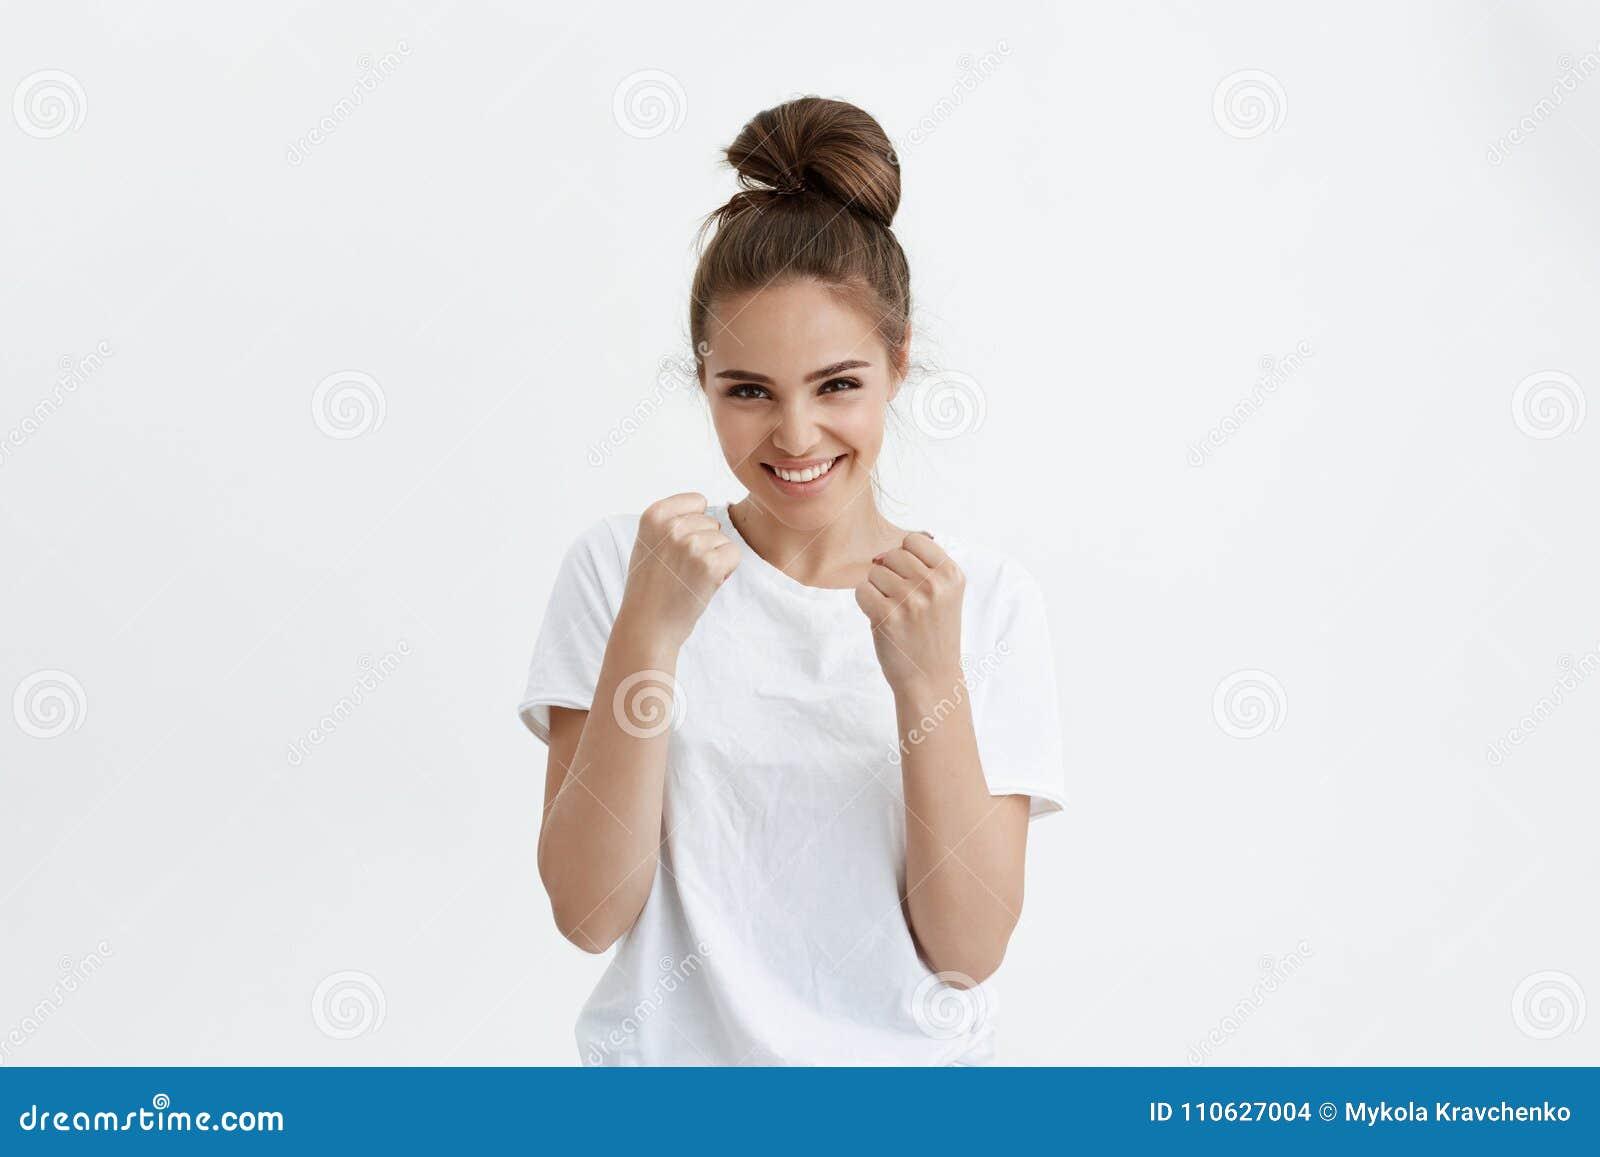 Women girls female fist fights think, that